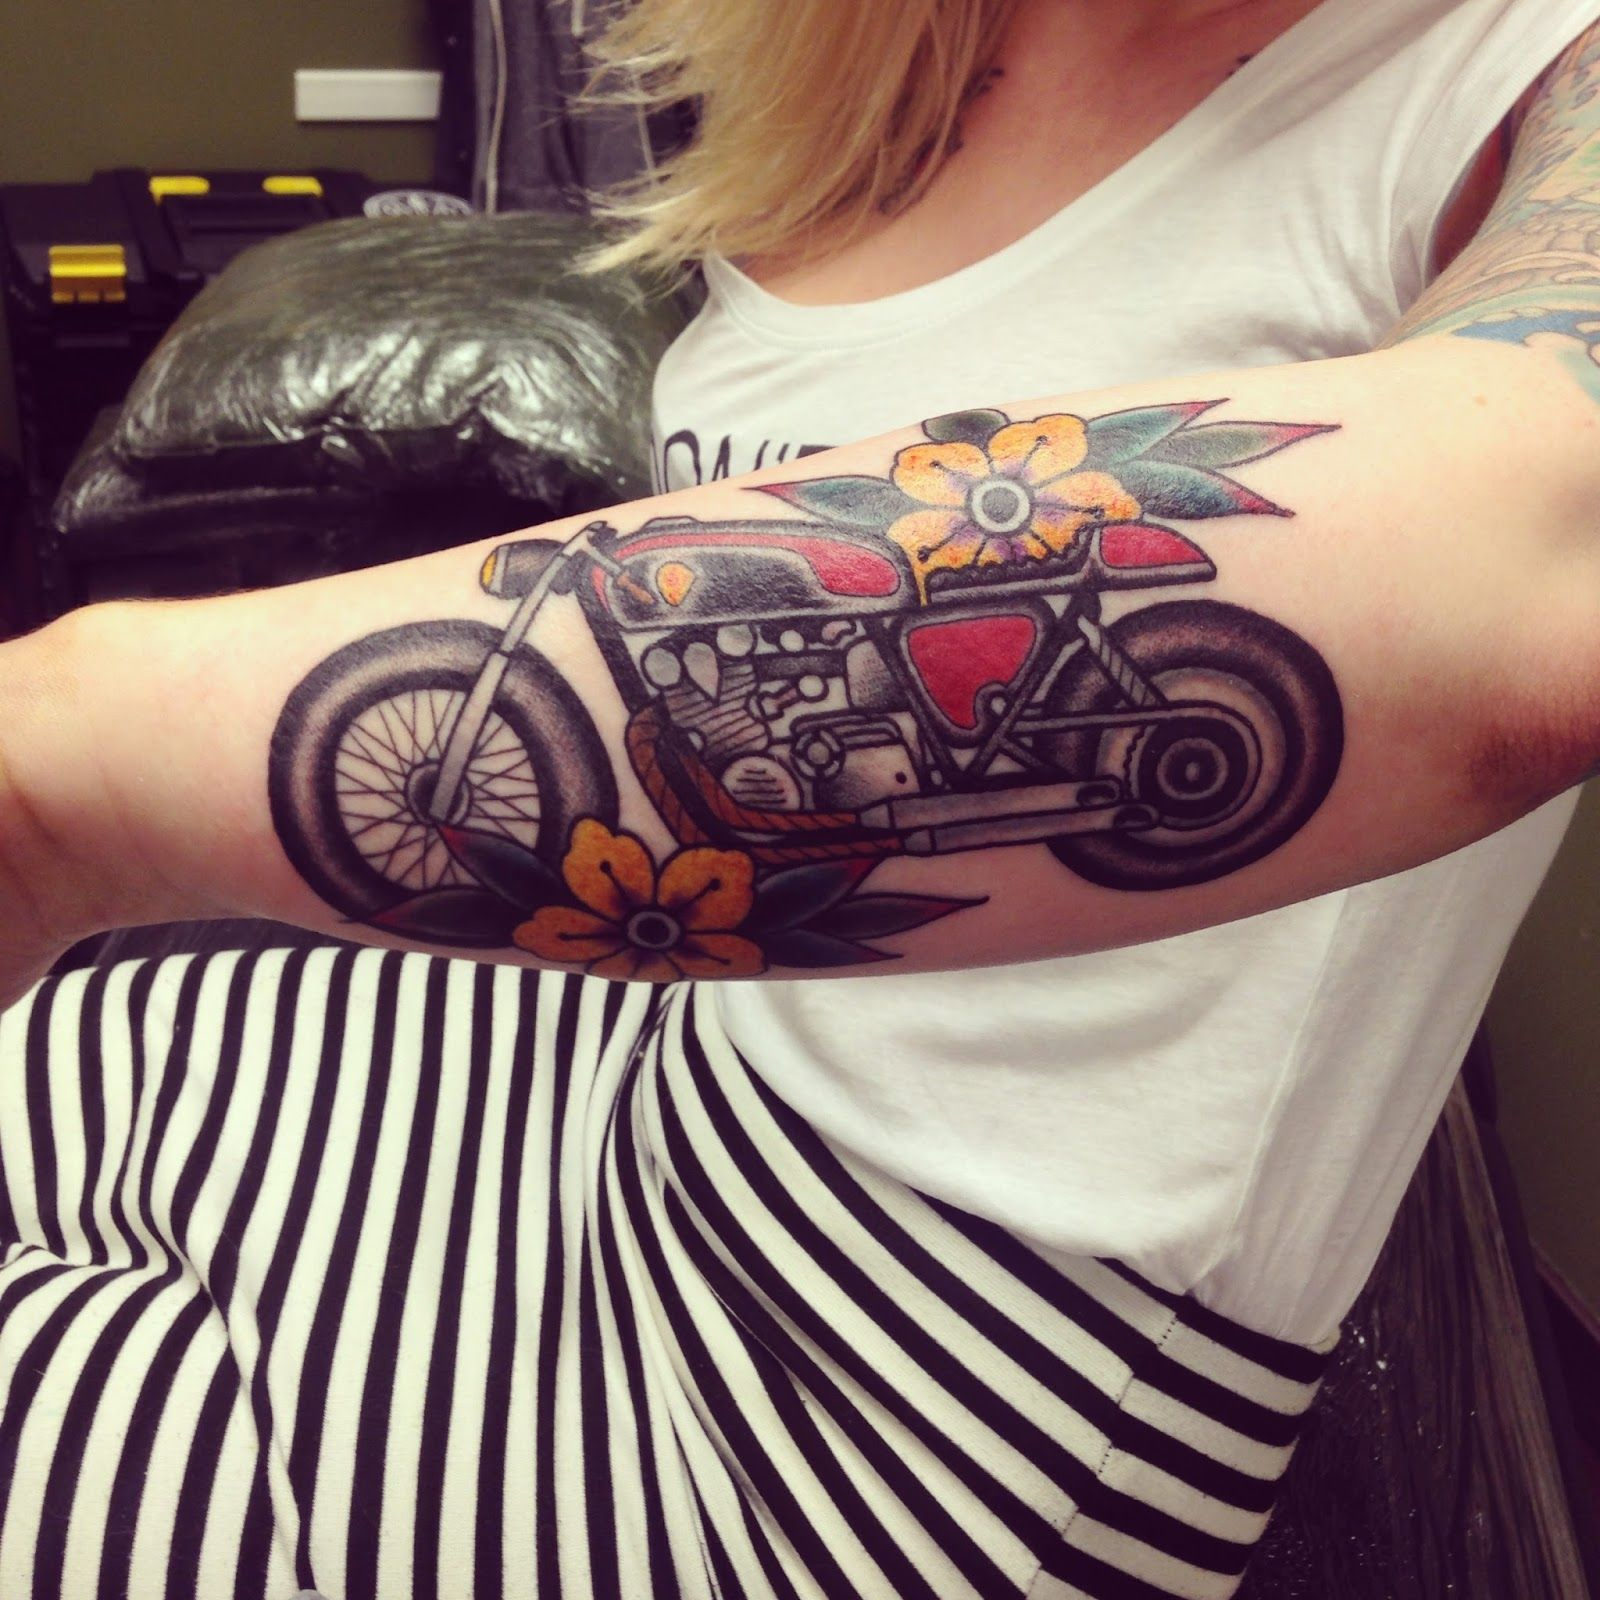 Motorcycle with biker tattoo - Rad Motorbike Tattoo More